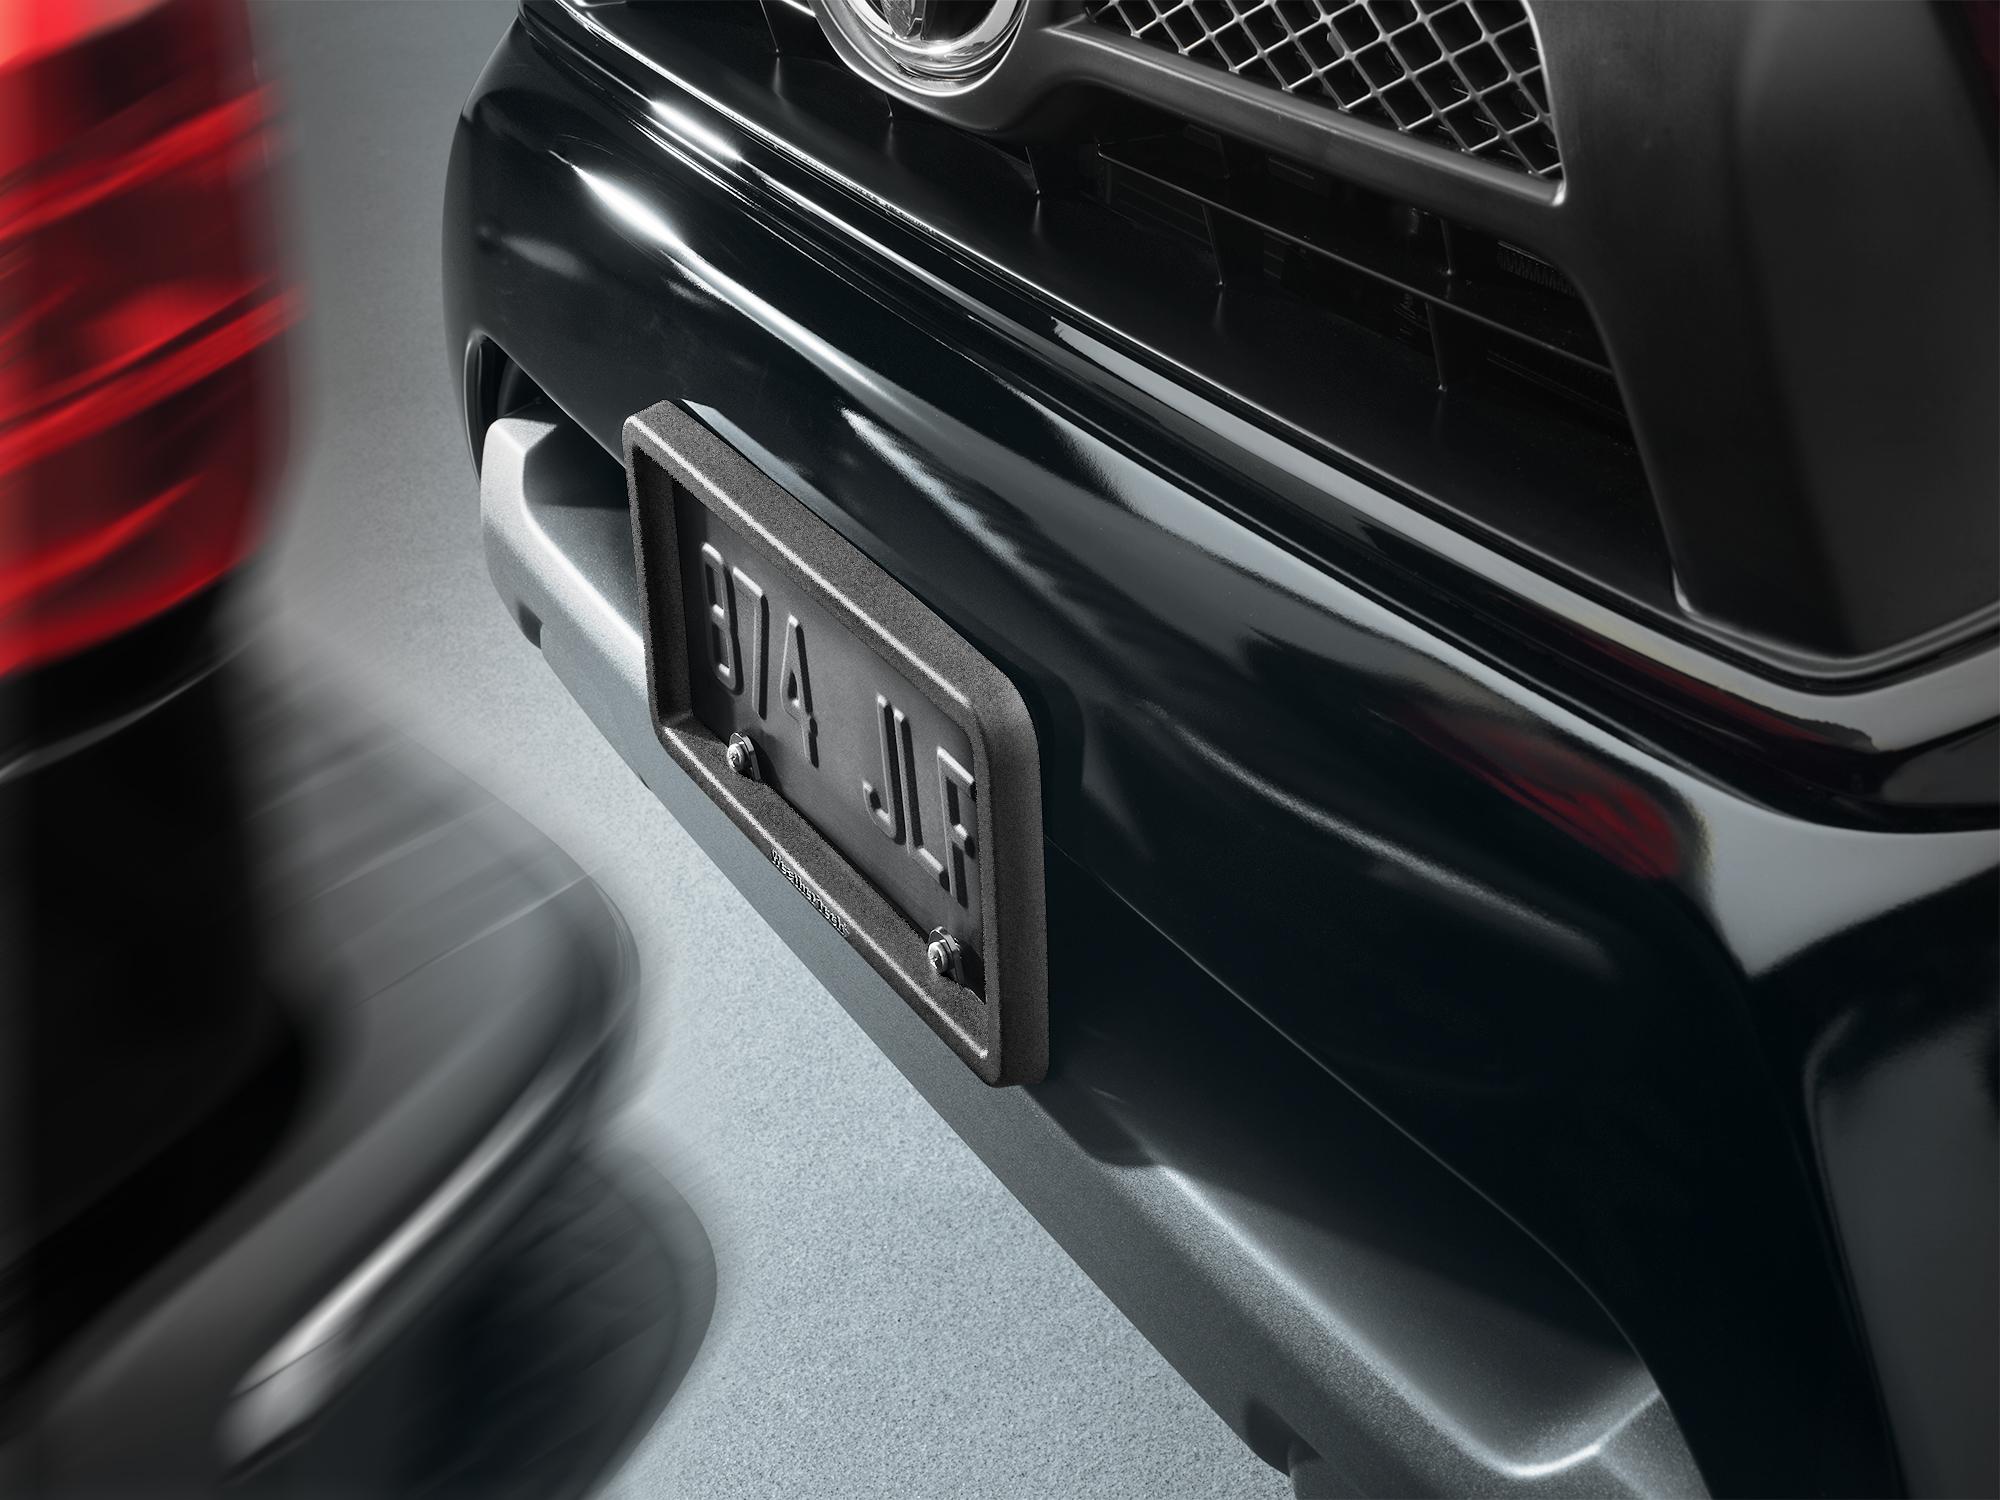 WeatherTech BumpFrame installed on a vehicle.